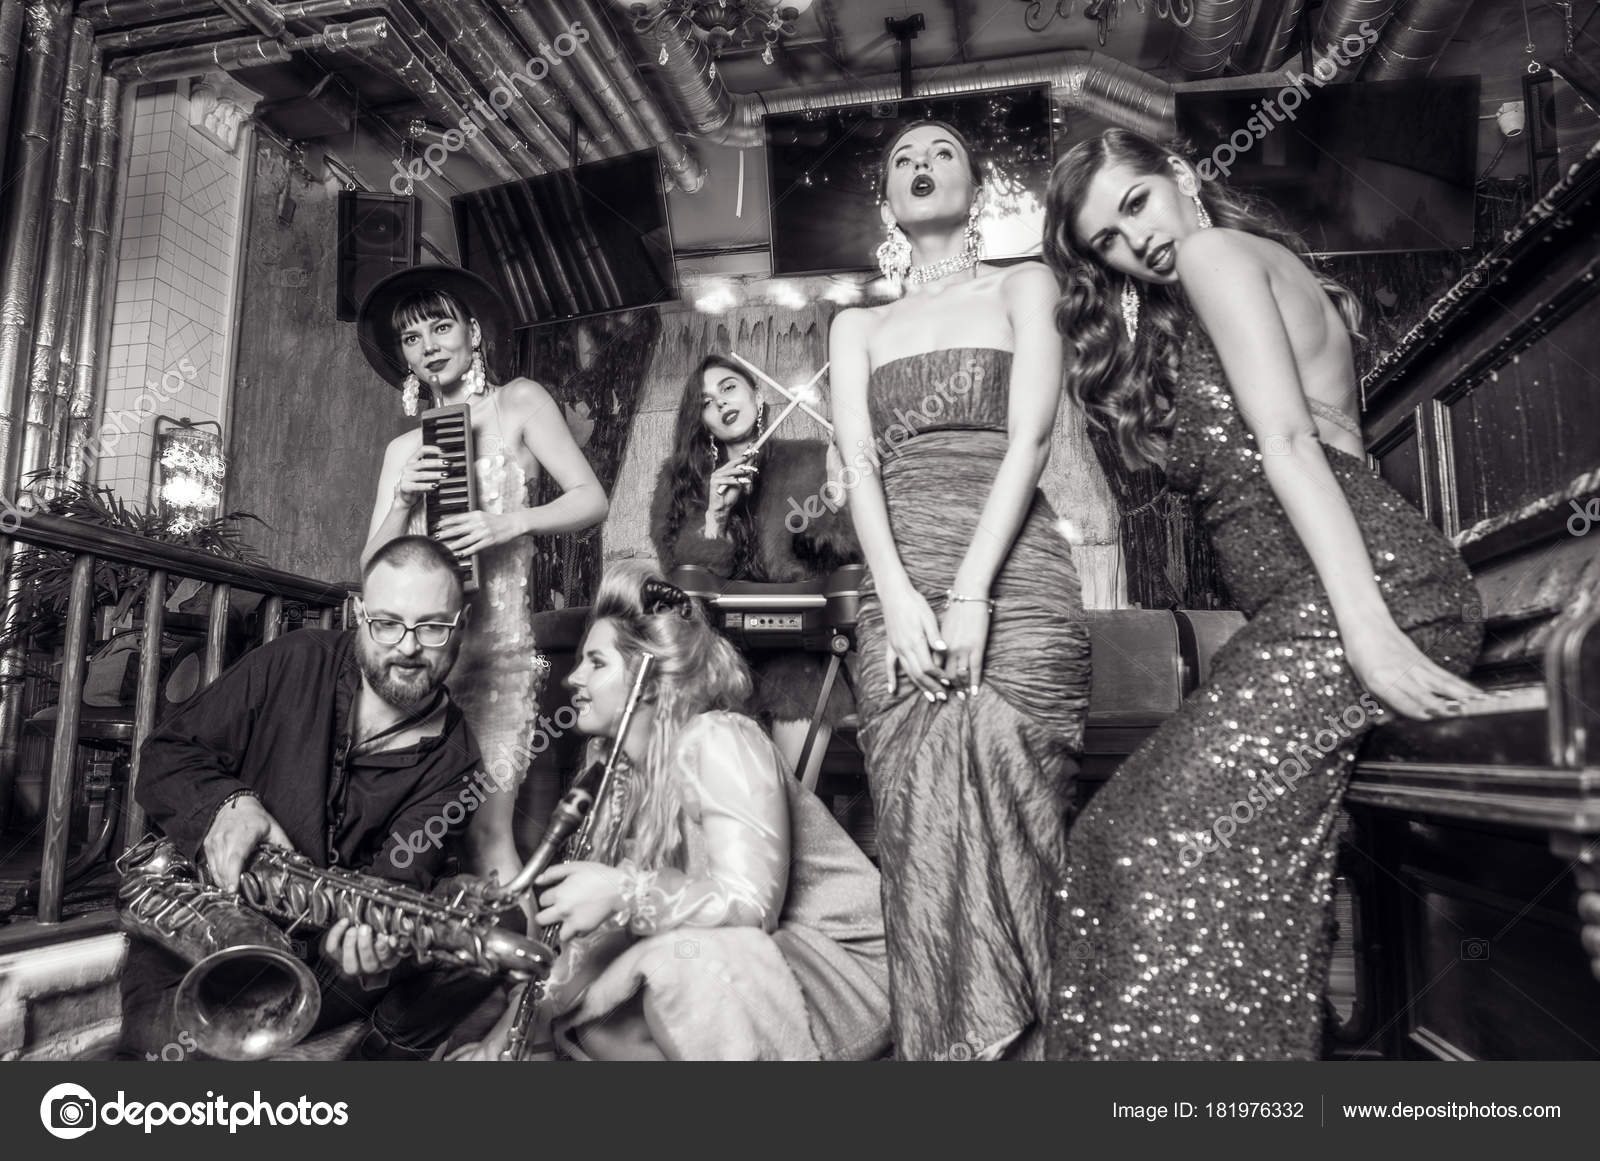 7b8dcf82c52 Grupo de jovens elegantes vestidos estilo clássico no interior do clube de  luxo. Foto preto